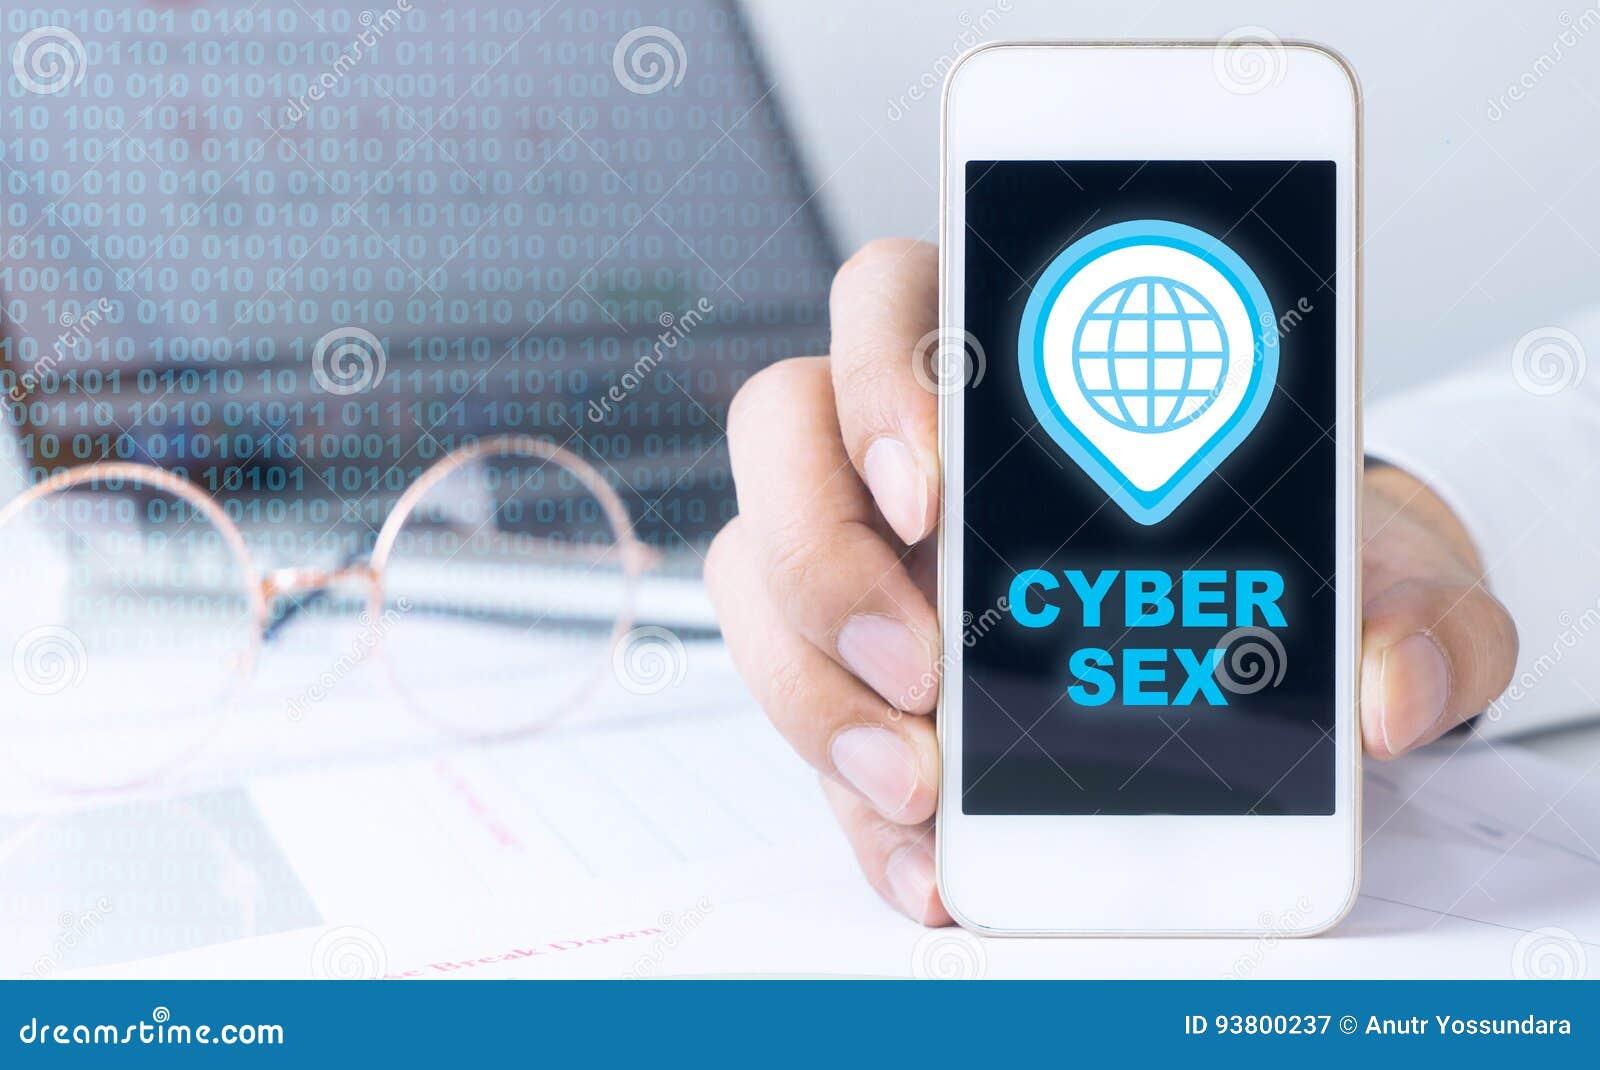 Бизнесмен держит телефон для секса кибер